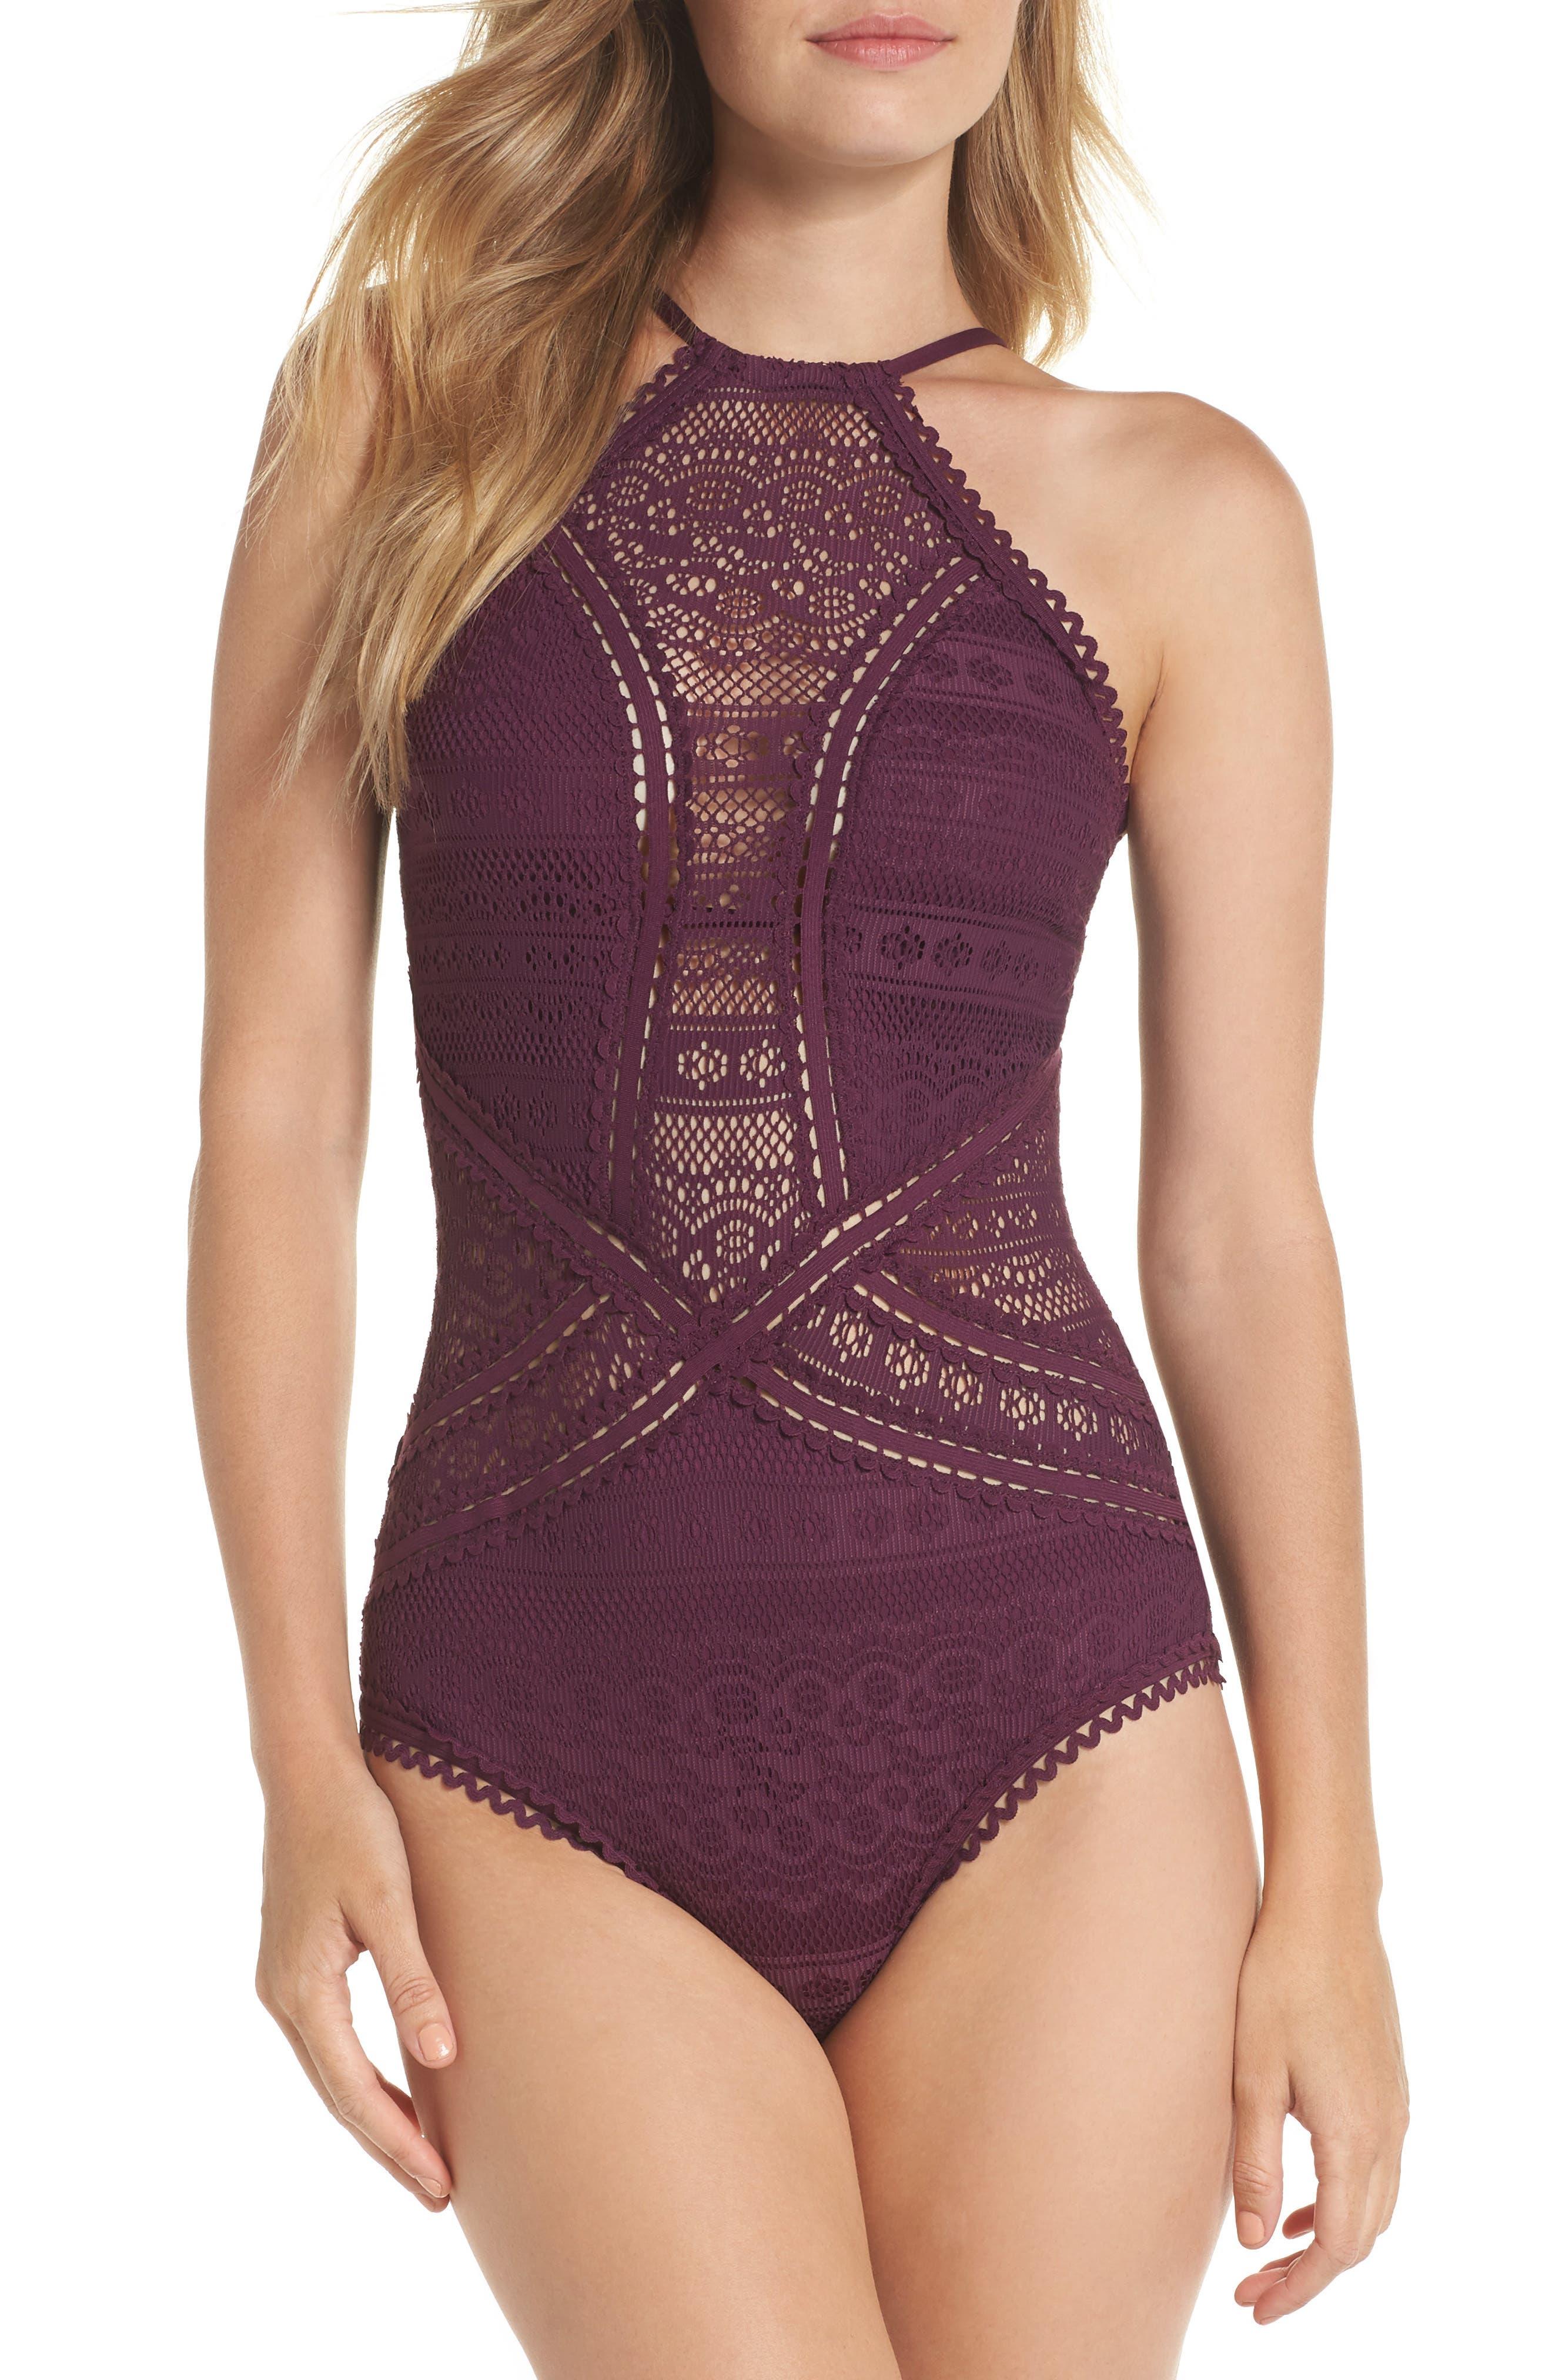 Vintage Bathing Suits | Retro Swimwear | Vintage Swimsuits Womens Becca Prairie Rose Crochet One-Piece Swimsuit Size X-Large - Burgundy $124.00 AT vintagedancer.com